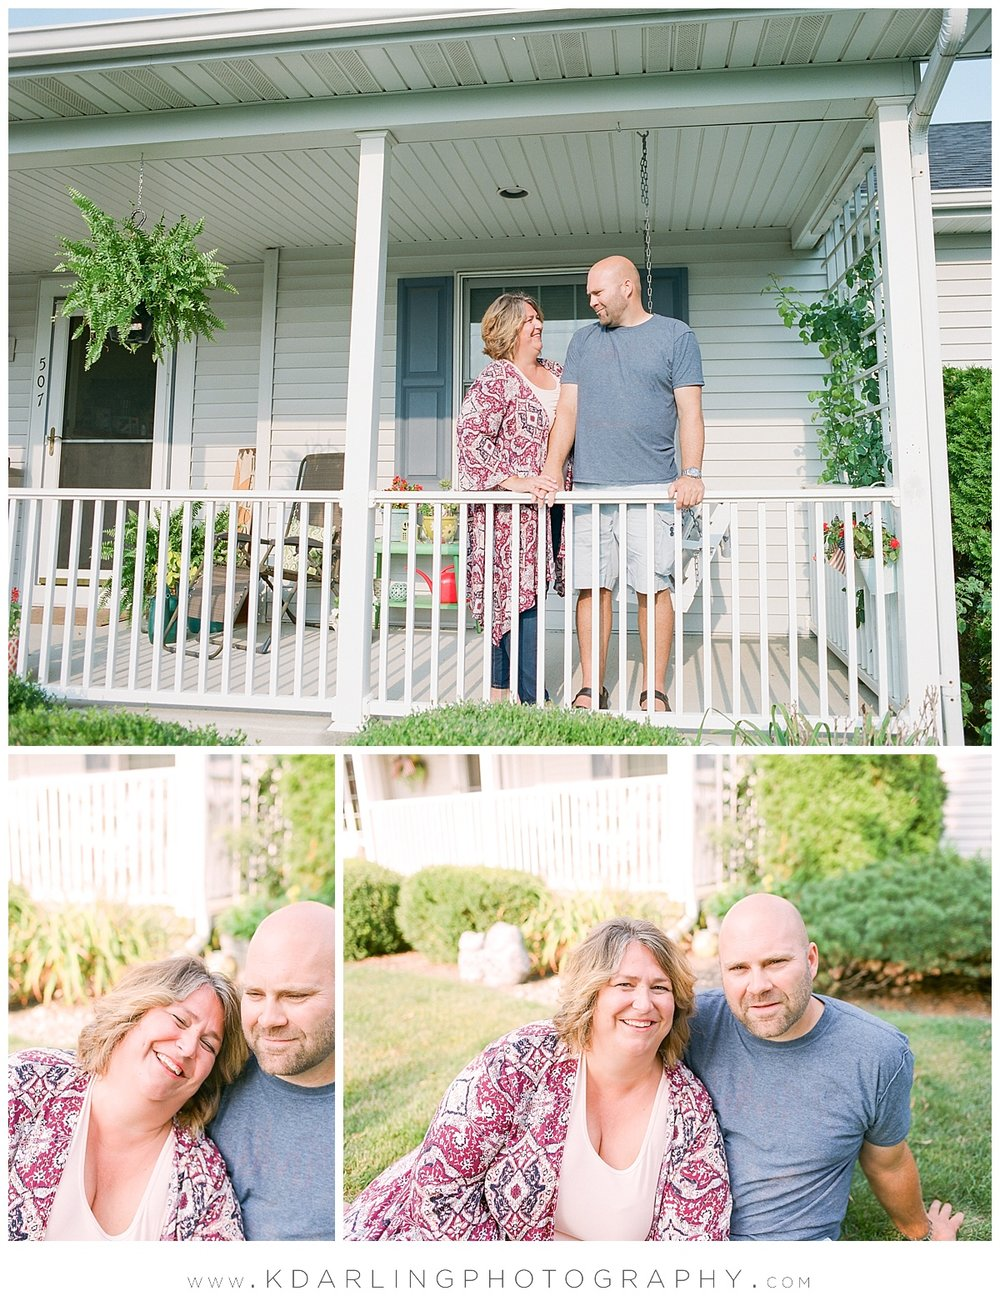 Central-illinois-Photographer-family-film-photography-Cissna-Park-mamiya-fuji-front-porch-session_0415.jpg